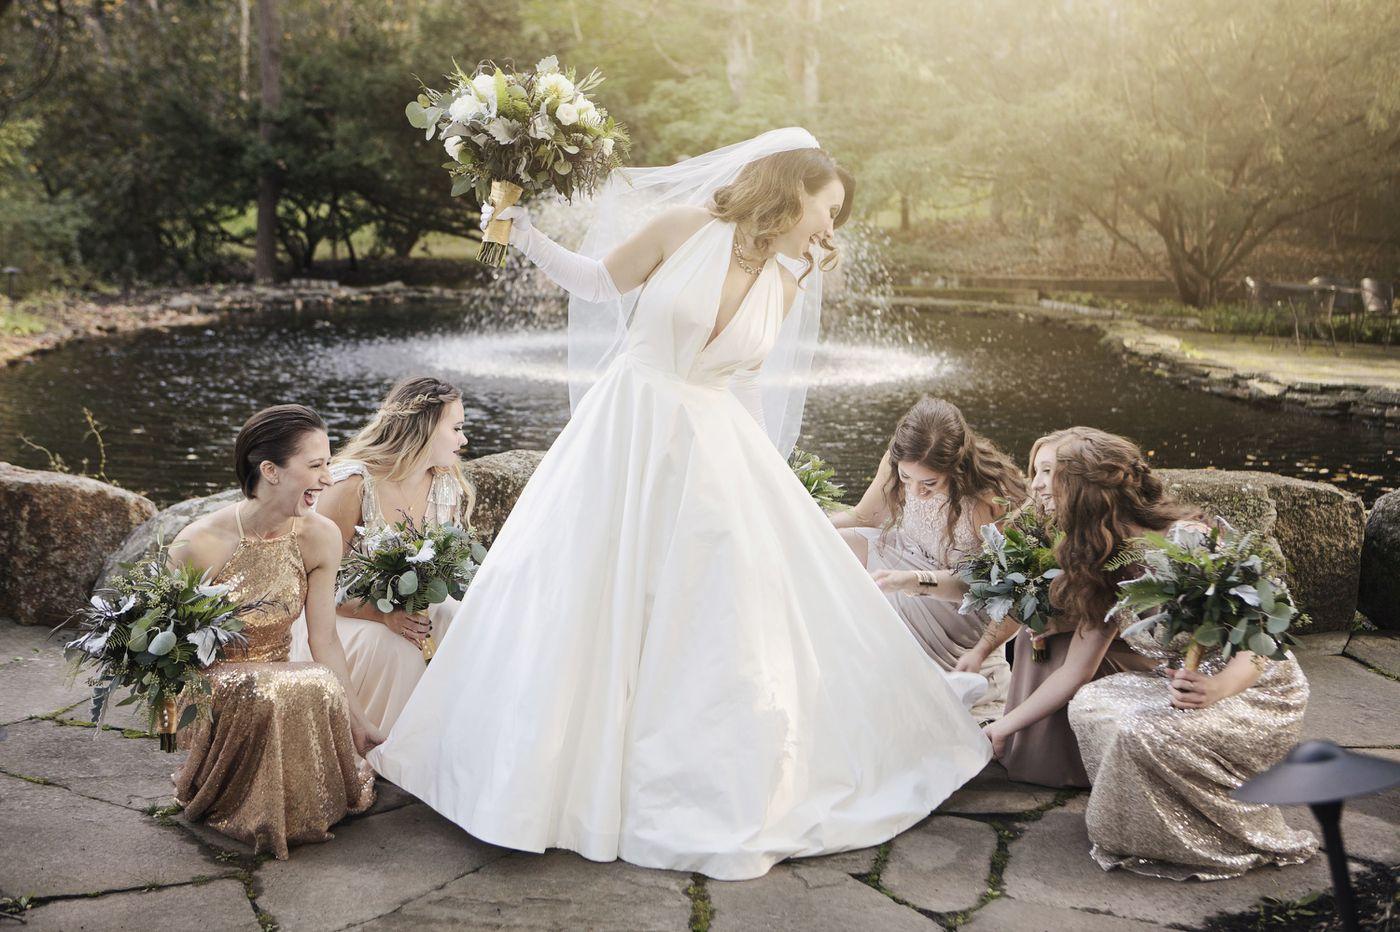 Philadelphia weddings: Alexa Miller and William Schaub